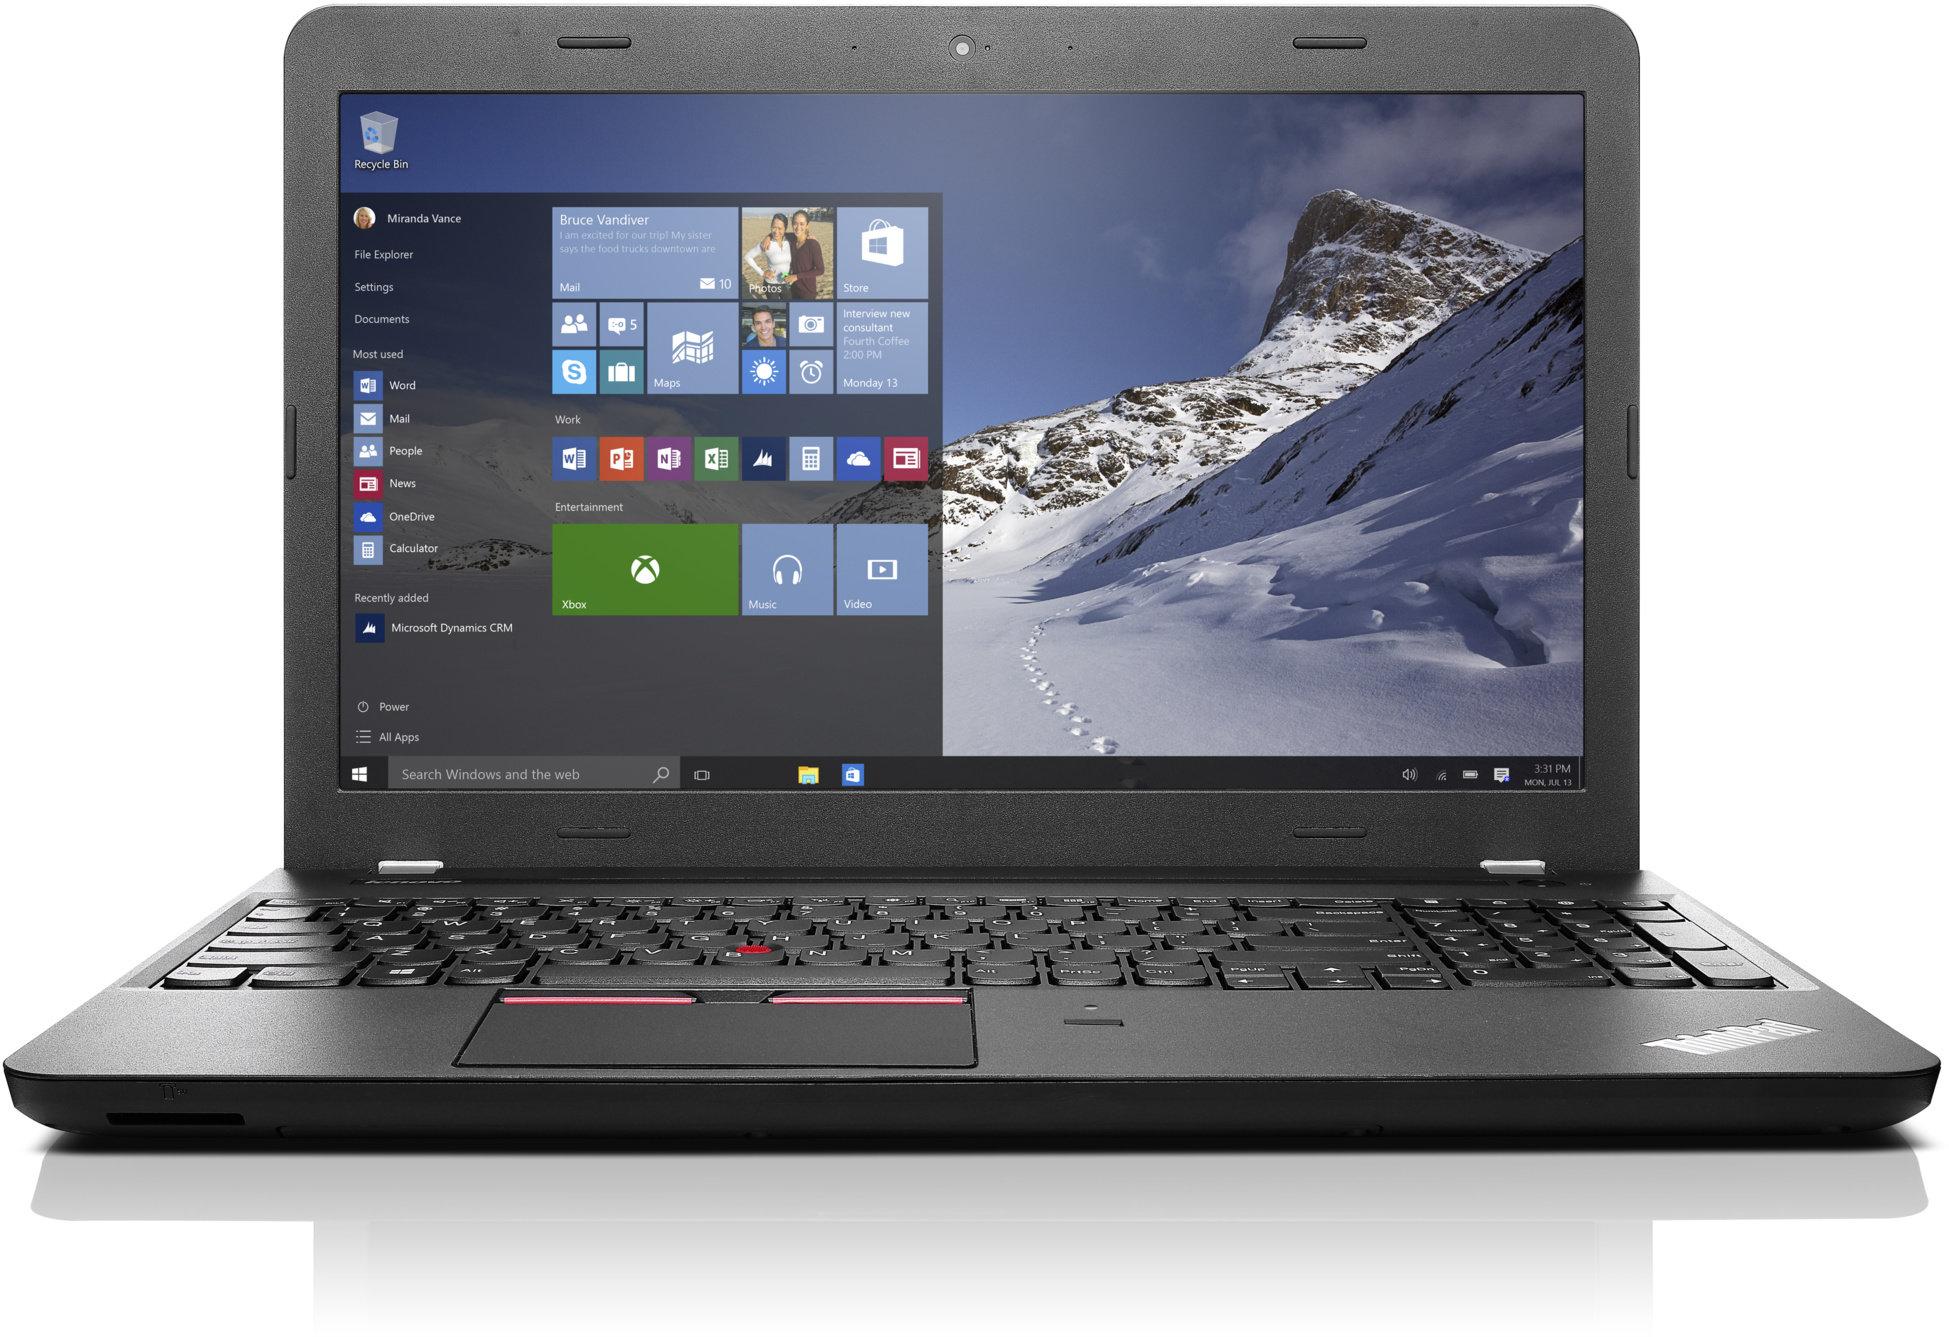 Recenze notebooku Lenovo ThinkPad Edge E560